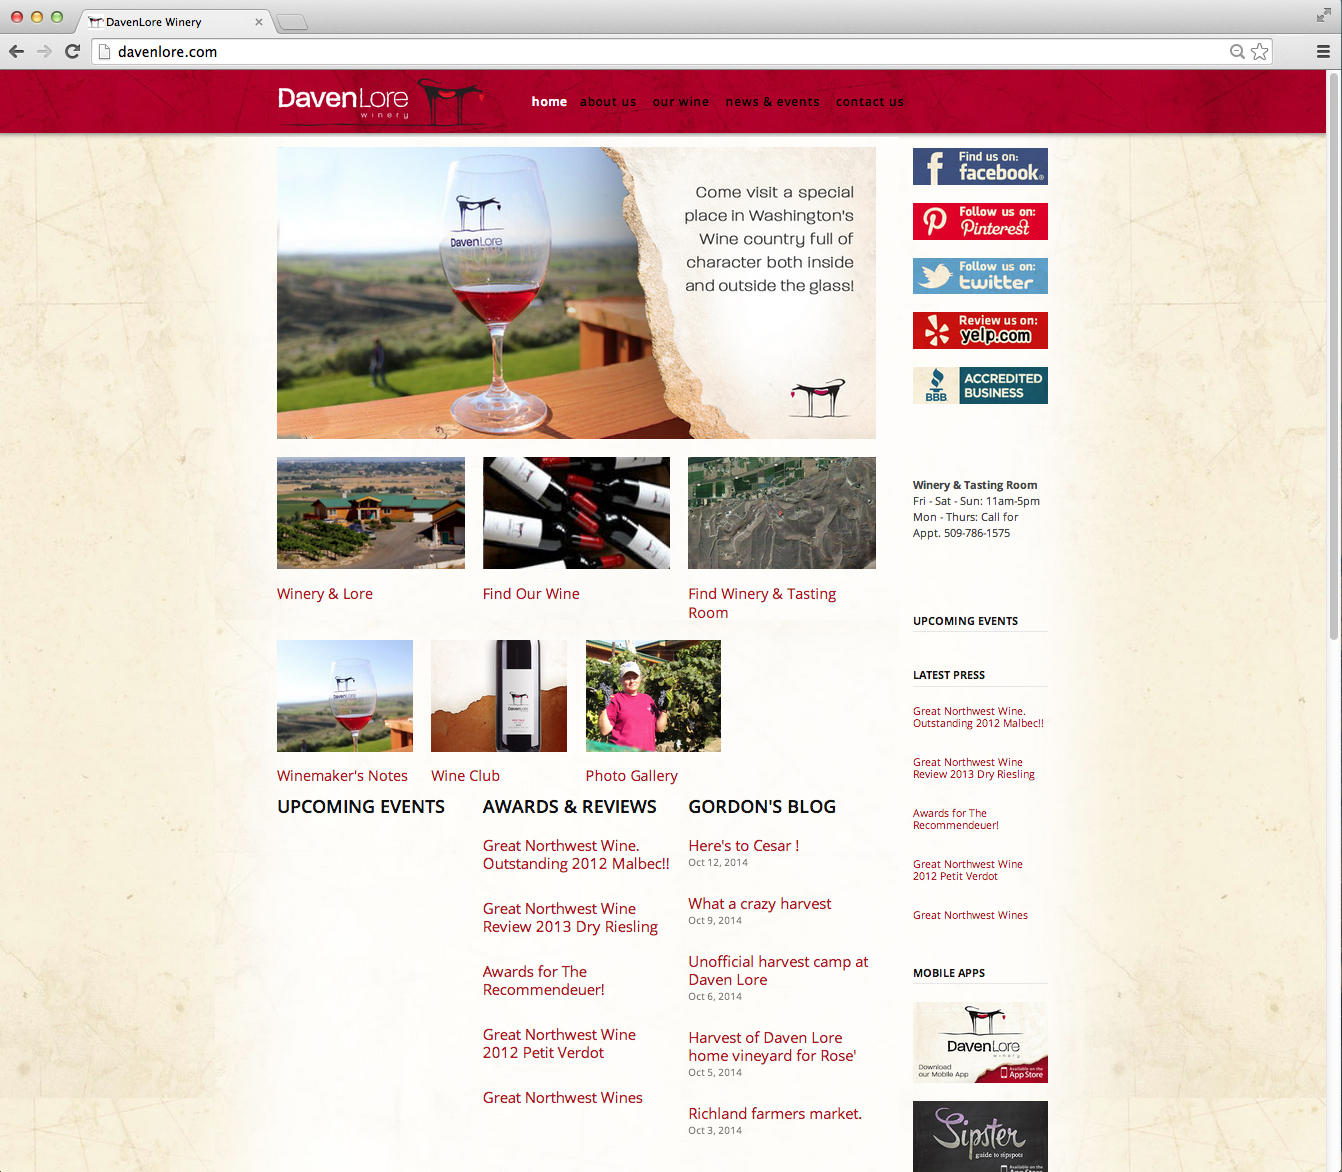 Daven Lore Winery